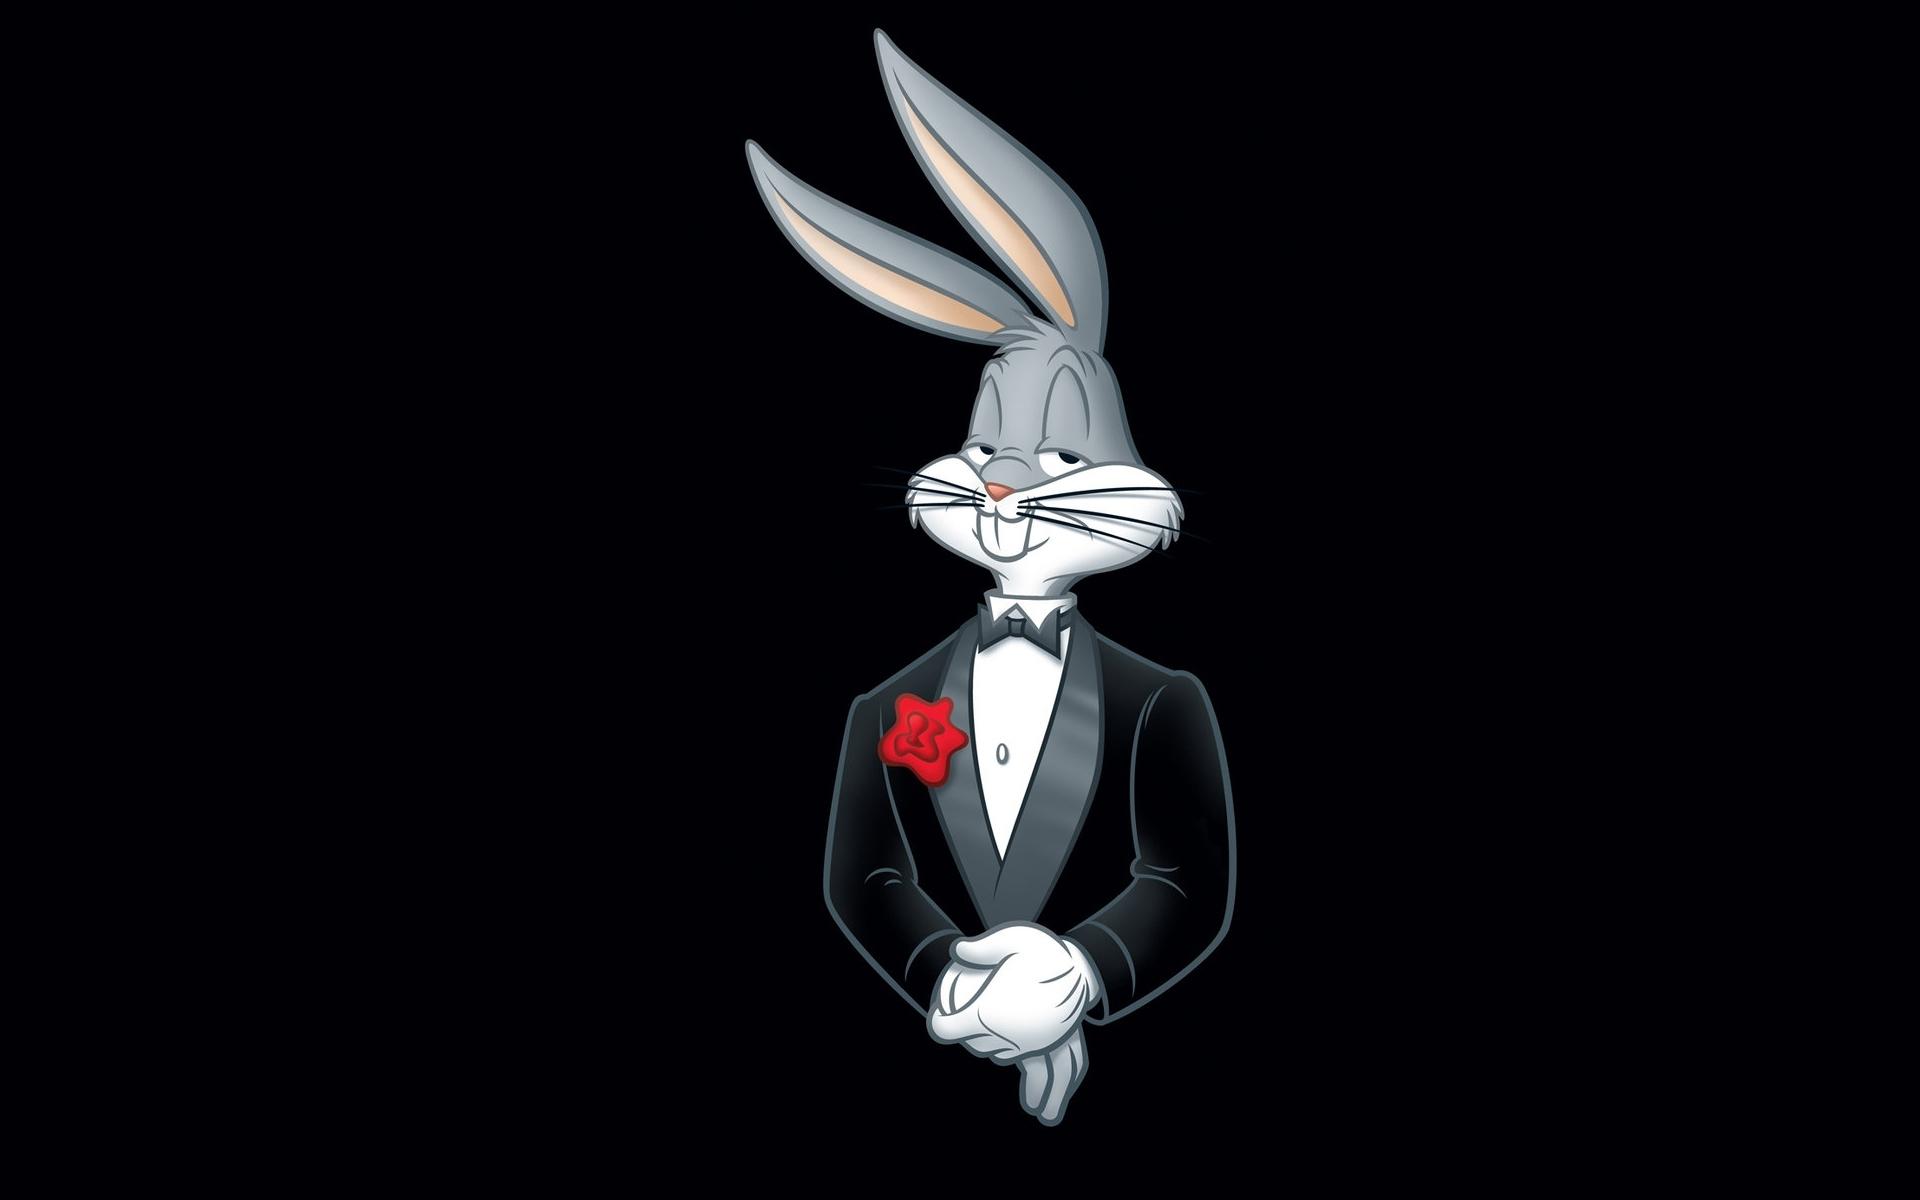 Bugs Bunny wallpaper 29775 1920x1200